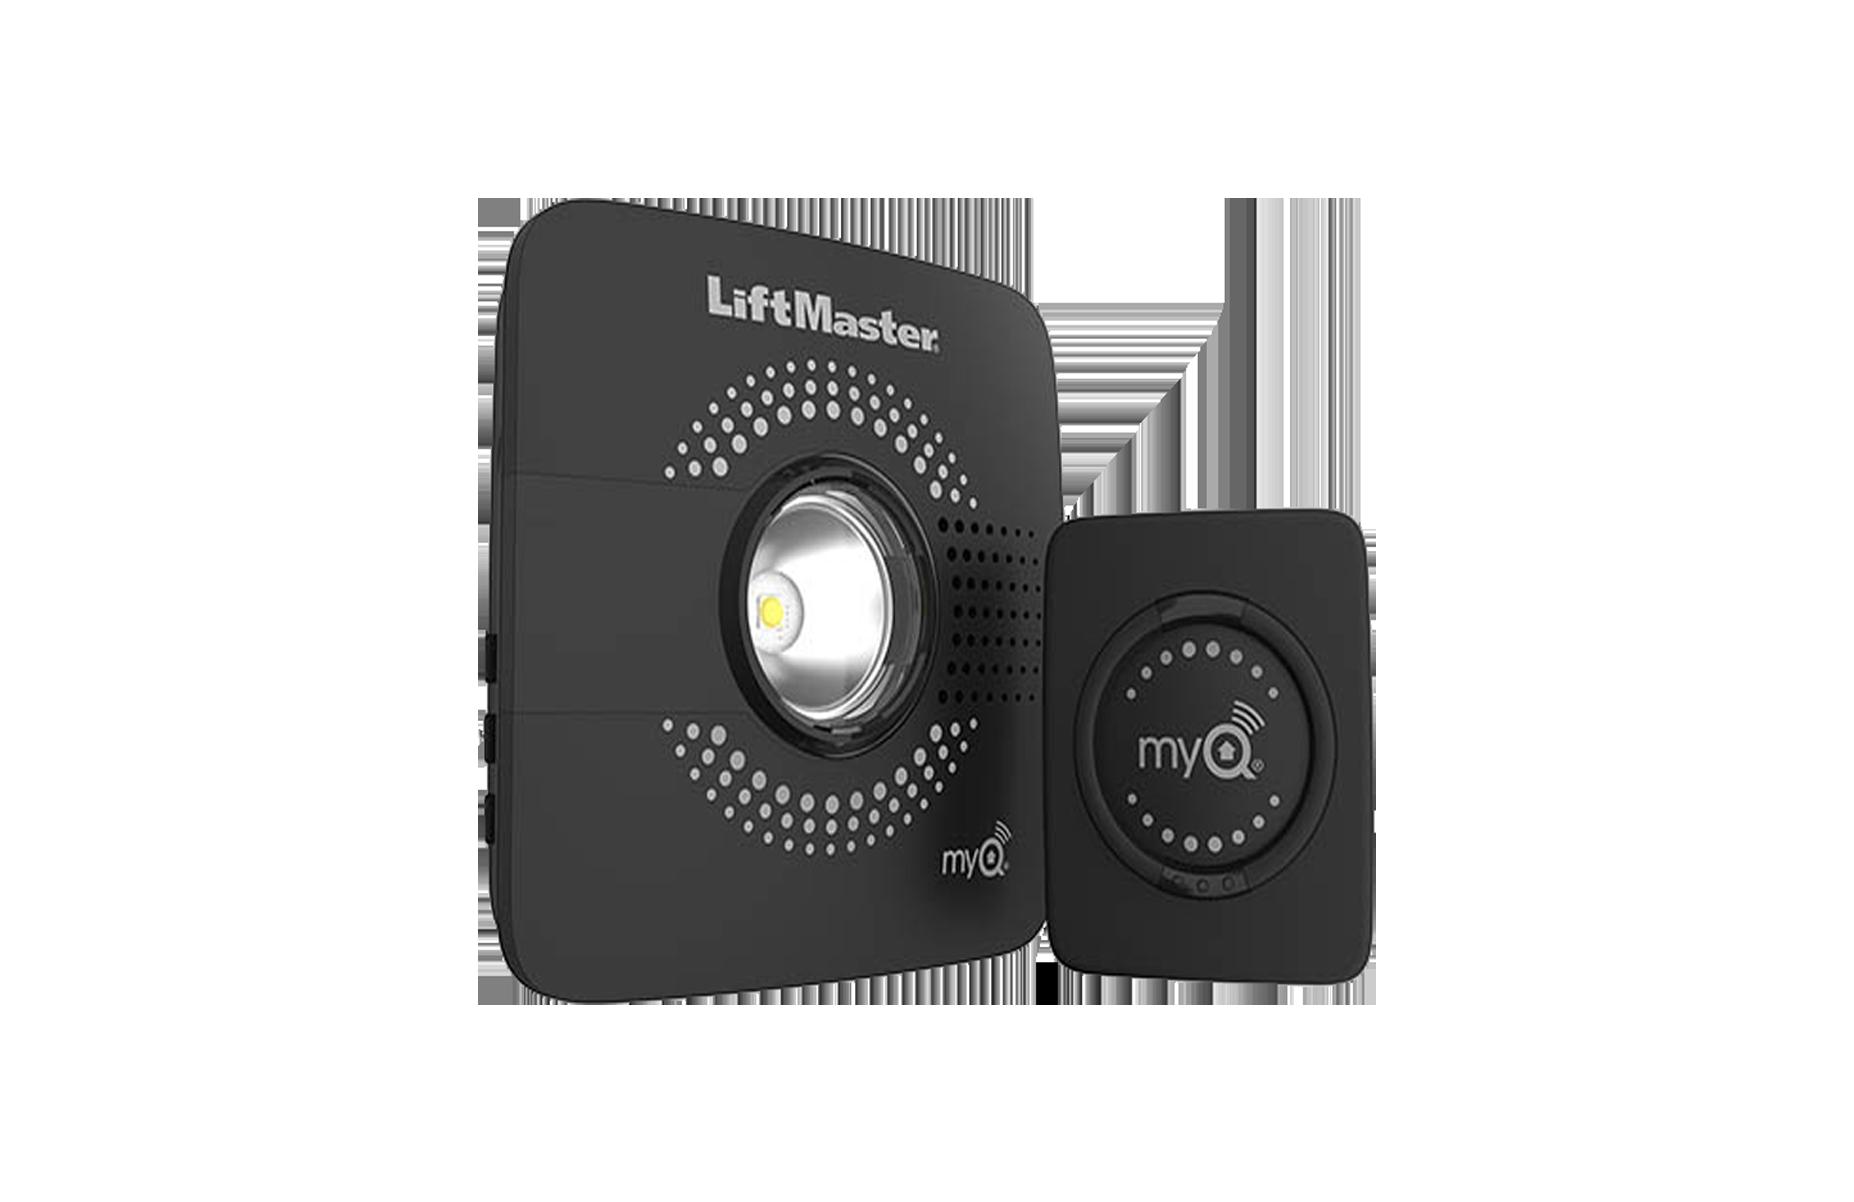 LMSGH_Card30l.png